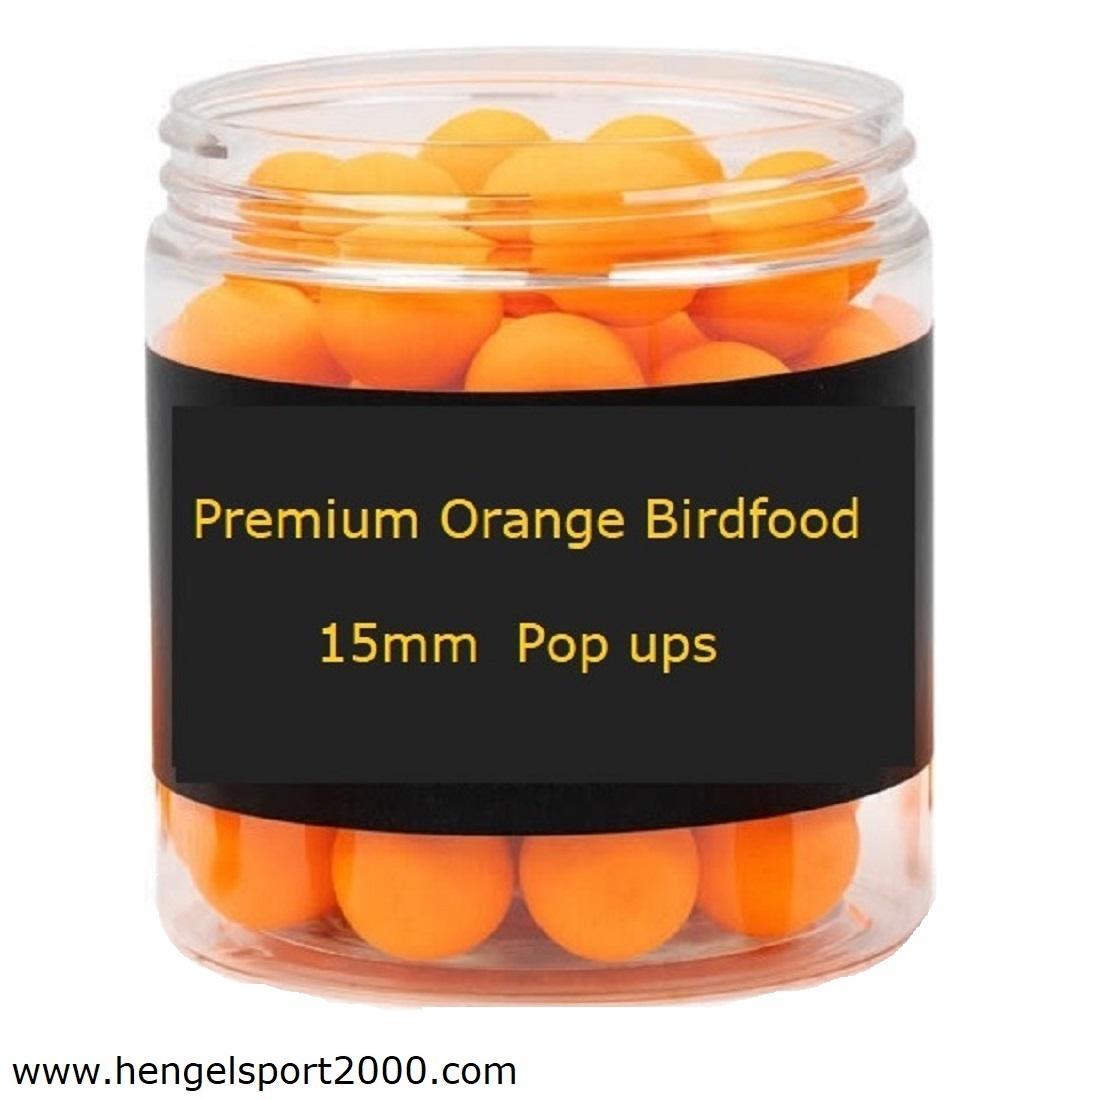 Premium Orange Birdfood Pop ups